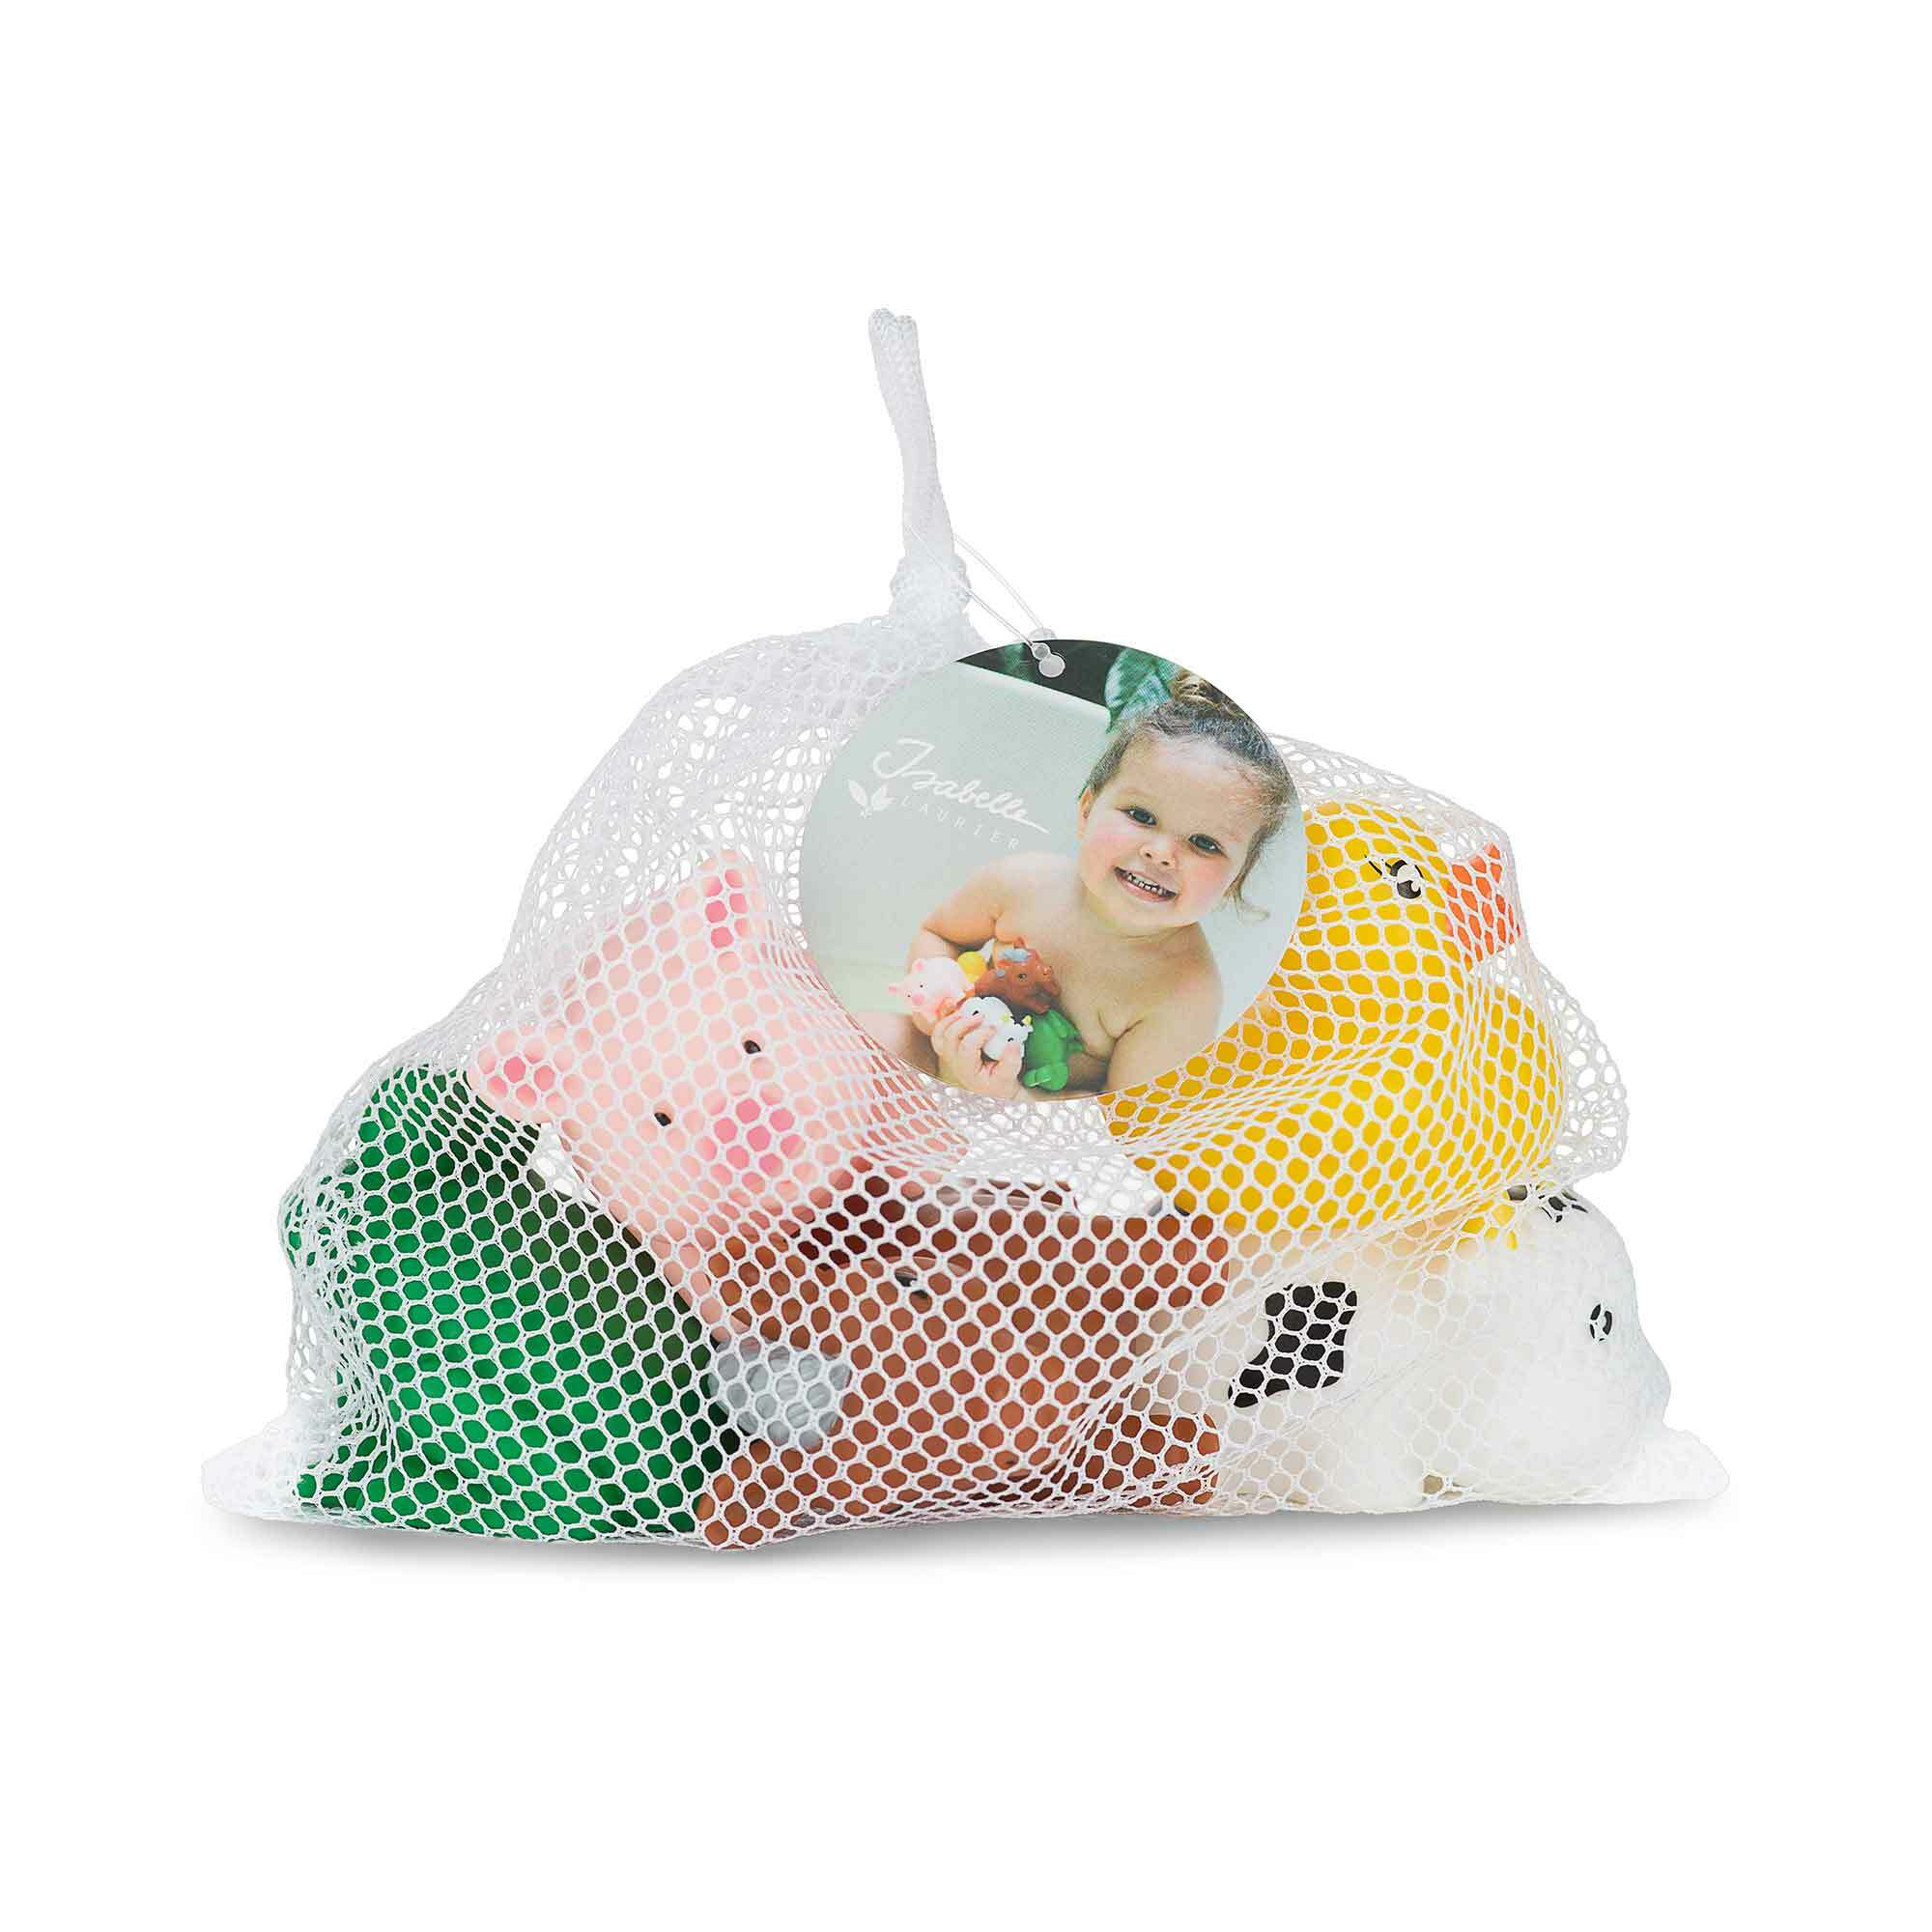 5 Rubber Bath Animals in a Bag